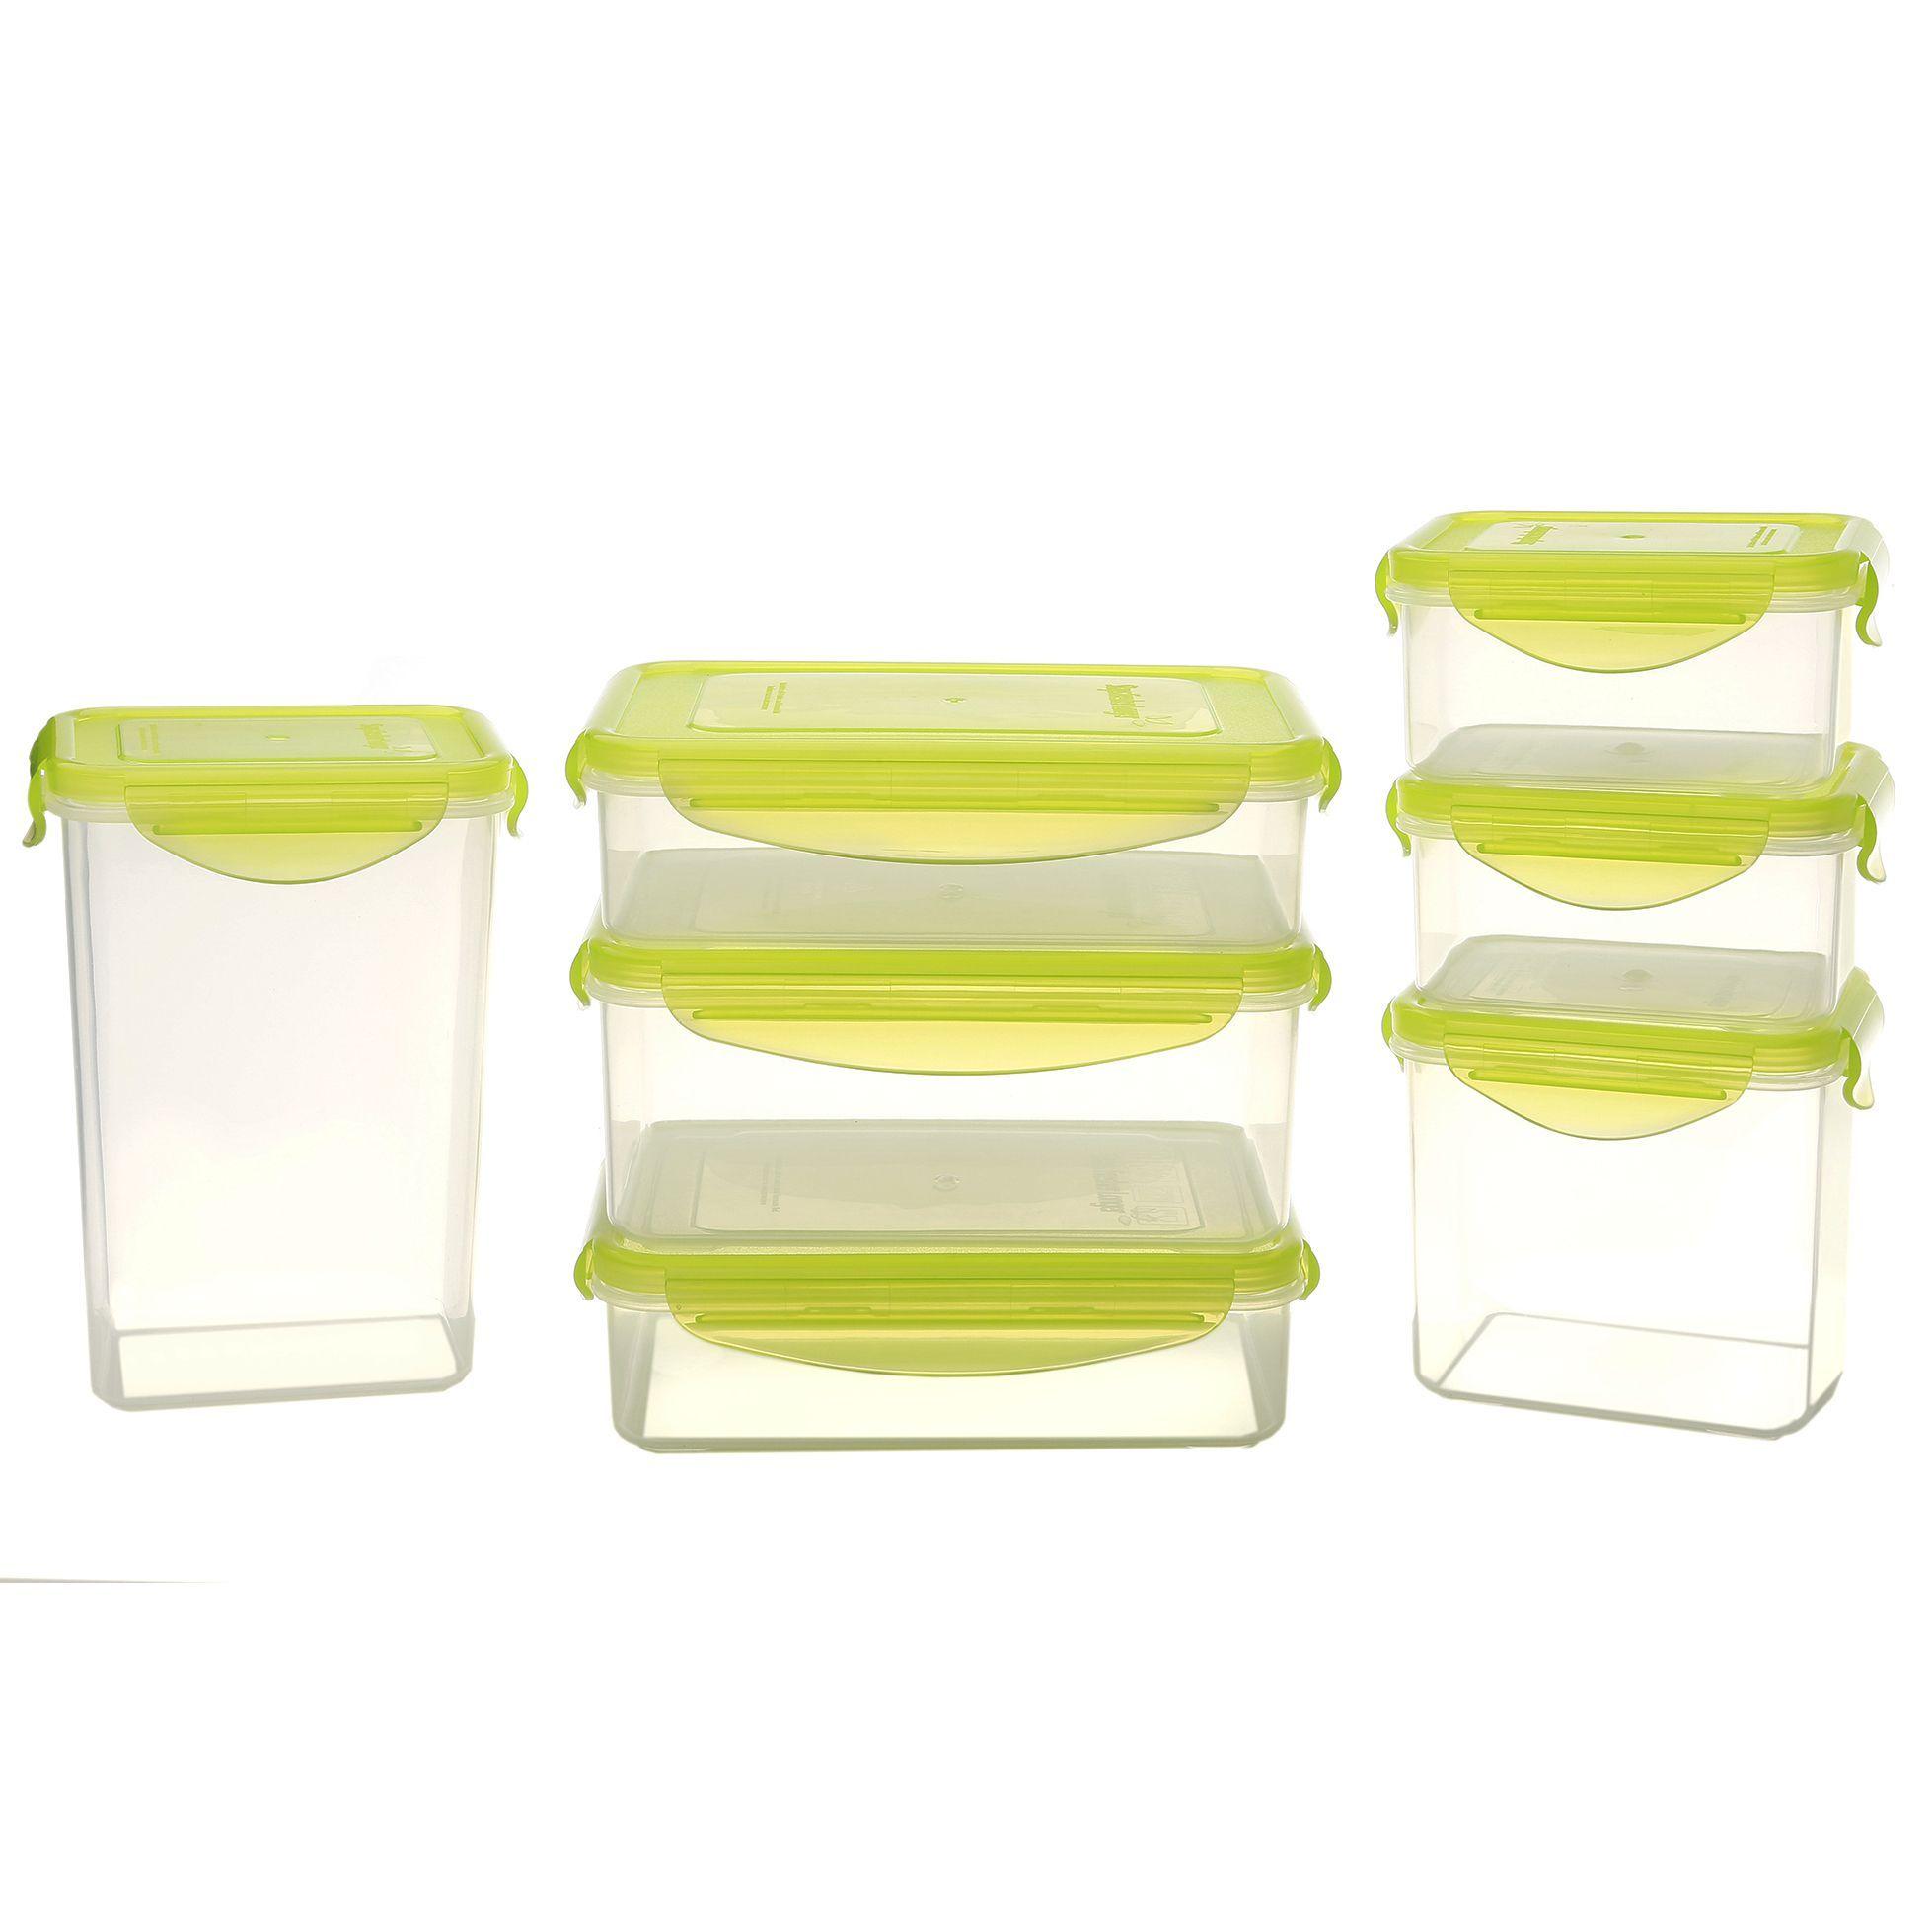 Kinetic Gogreen Green Clear Plastic 14 Piece Rectangular Food